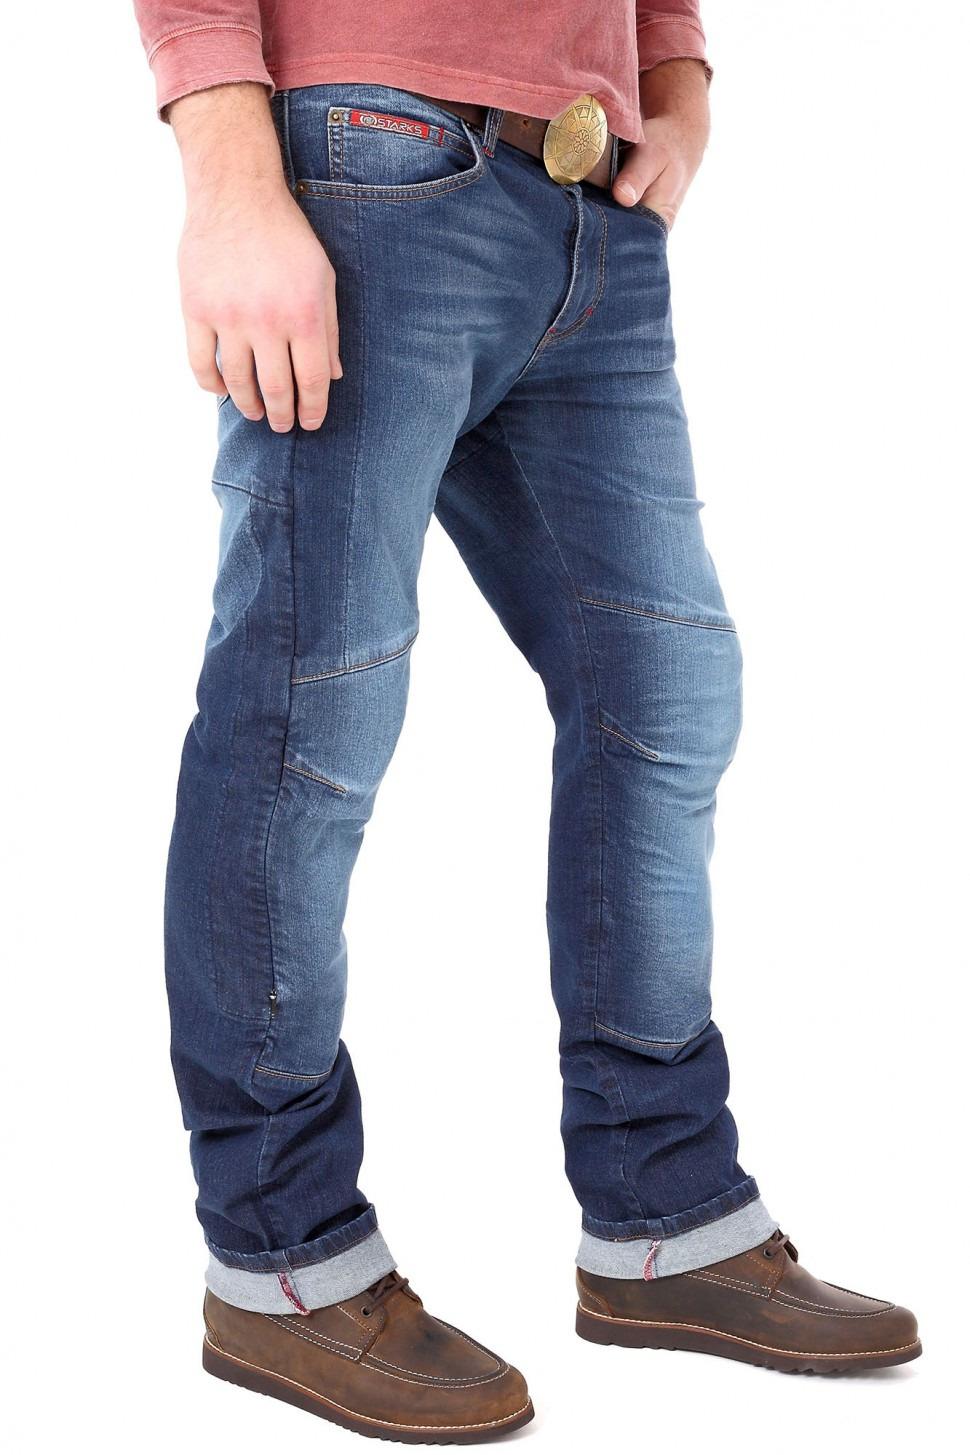 Мотобрюки мужские Starks Python Stretch, цвет: синий. Размер S